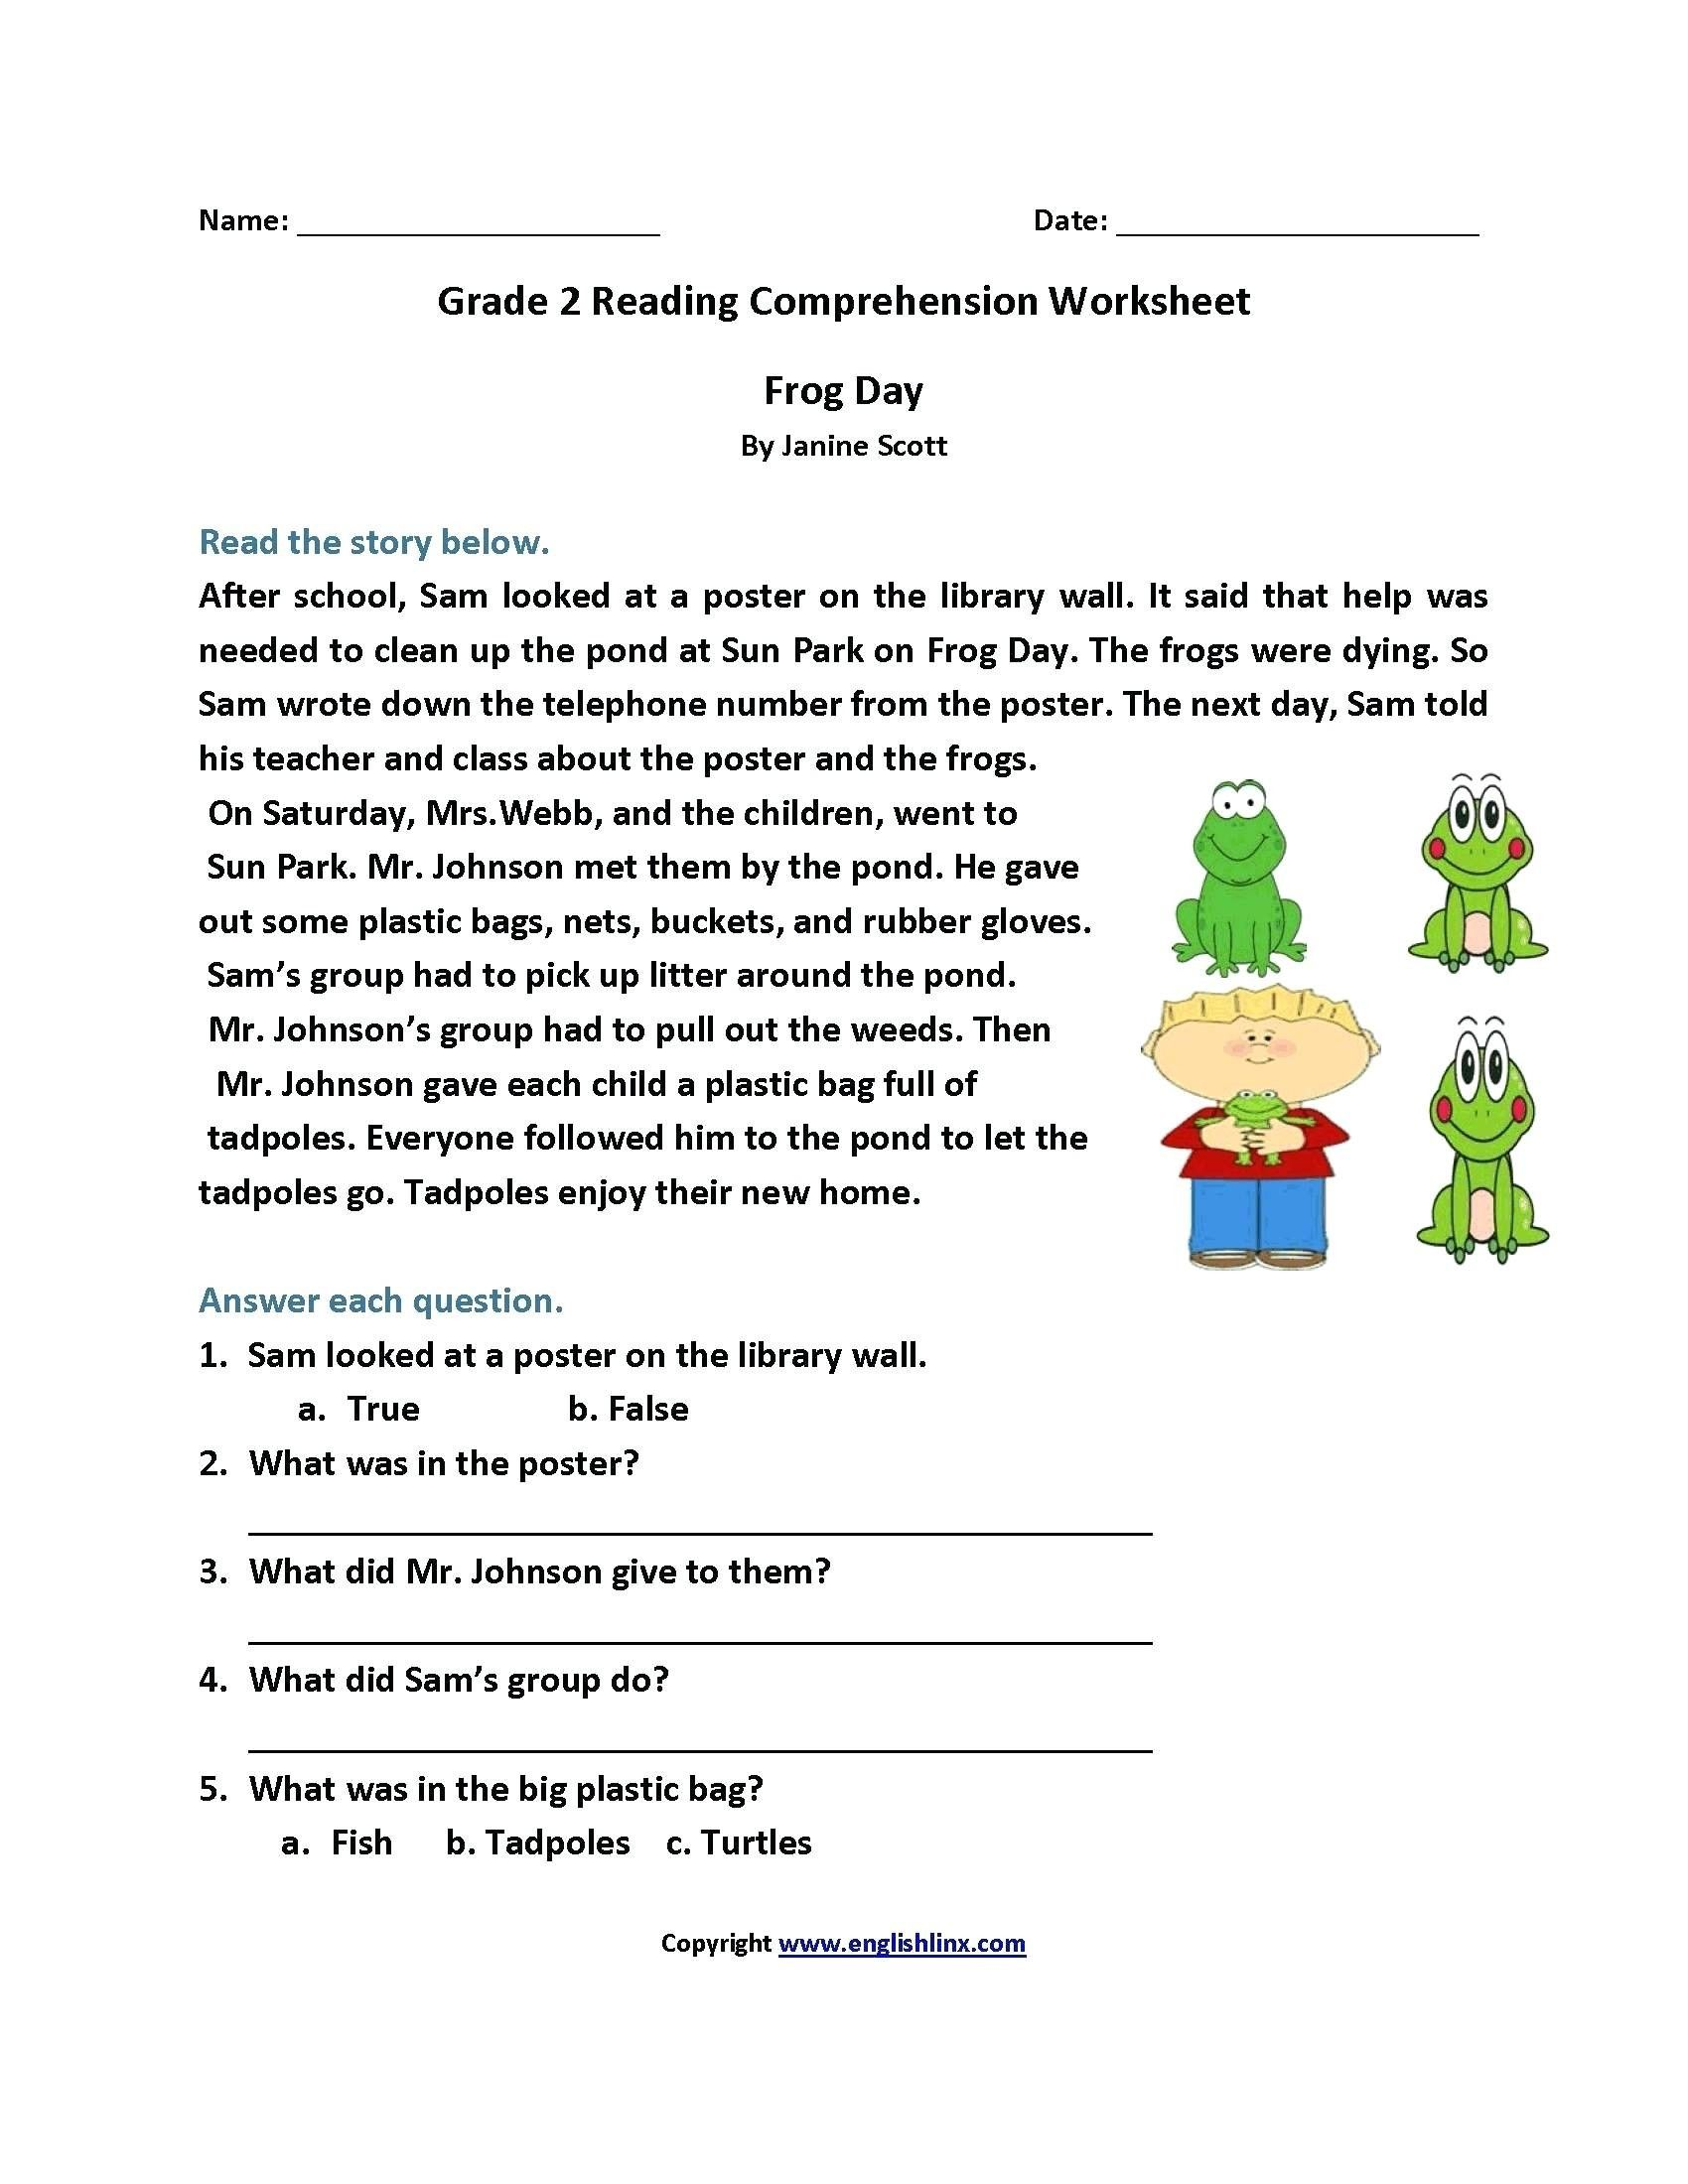 medium resolution of Cloze Procedure Worksheet 4th Grade   Printable Worksheets and Activities  for Teachers